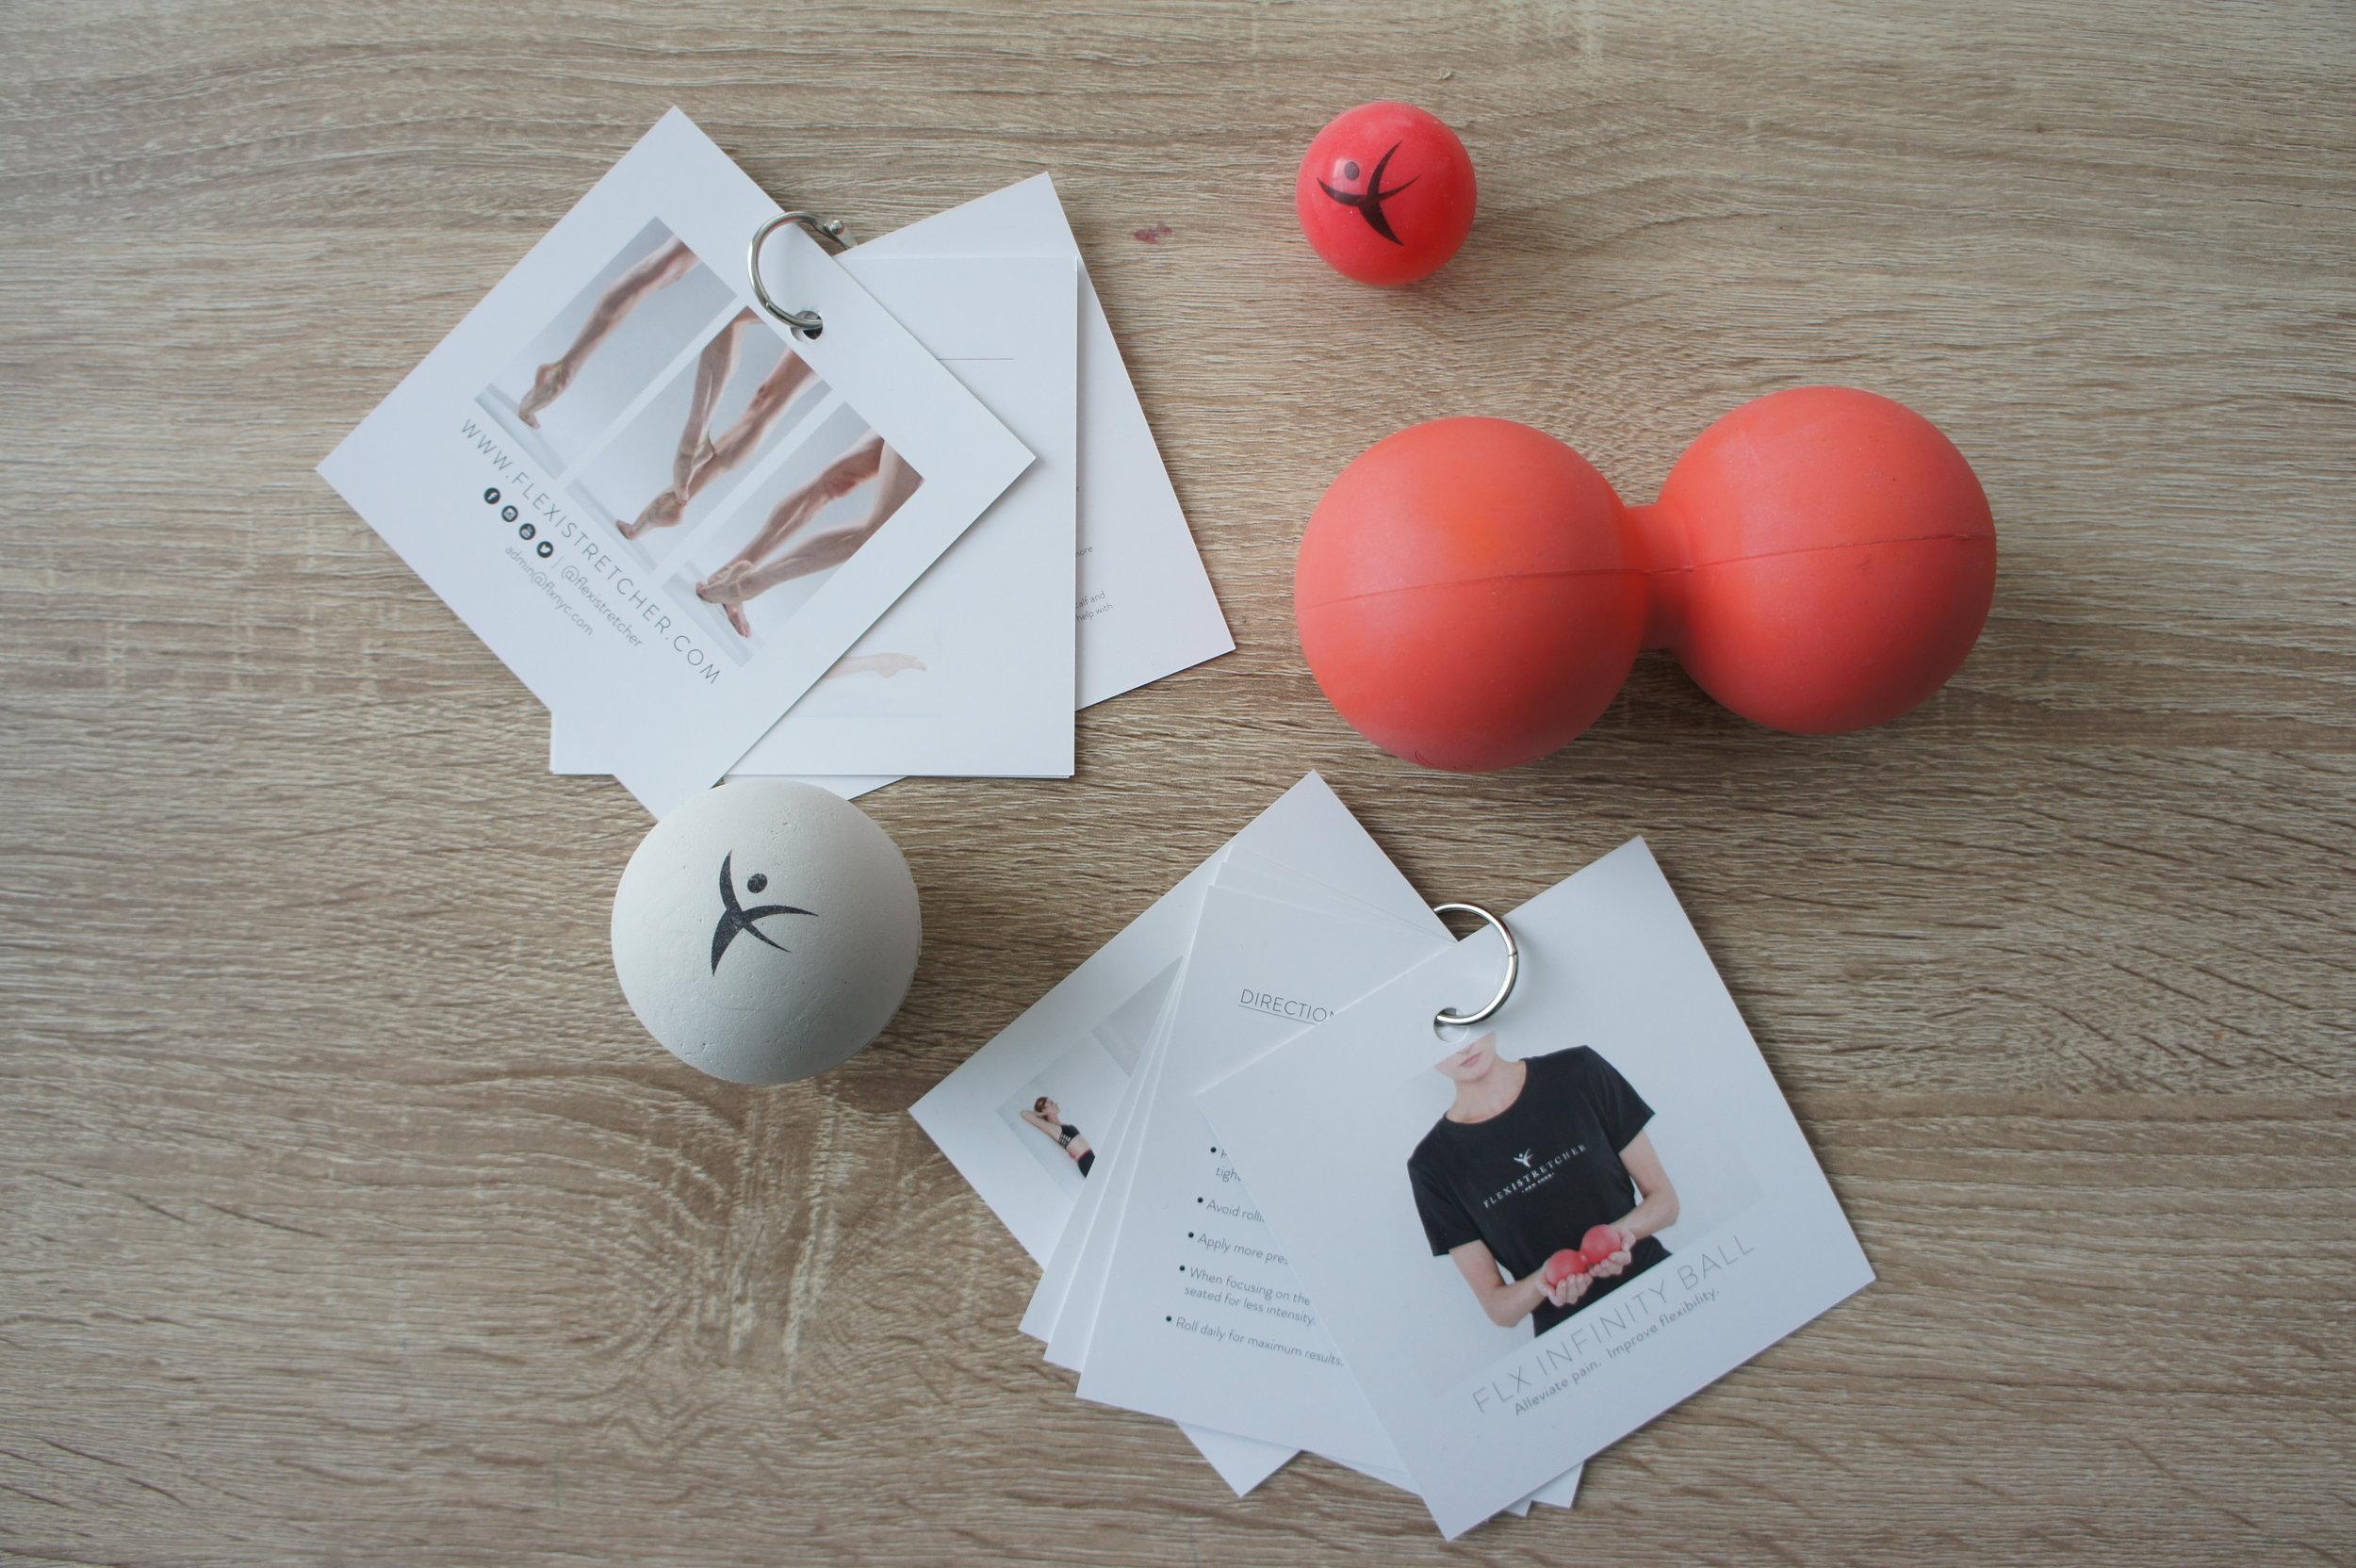 FLX Massage Balls